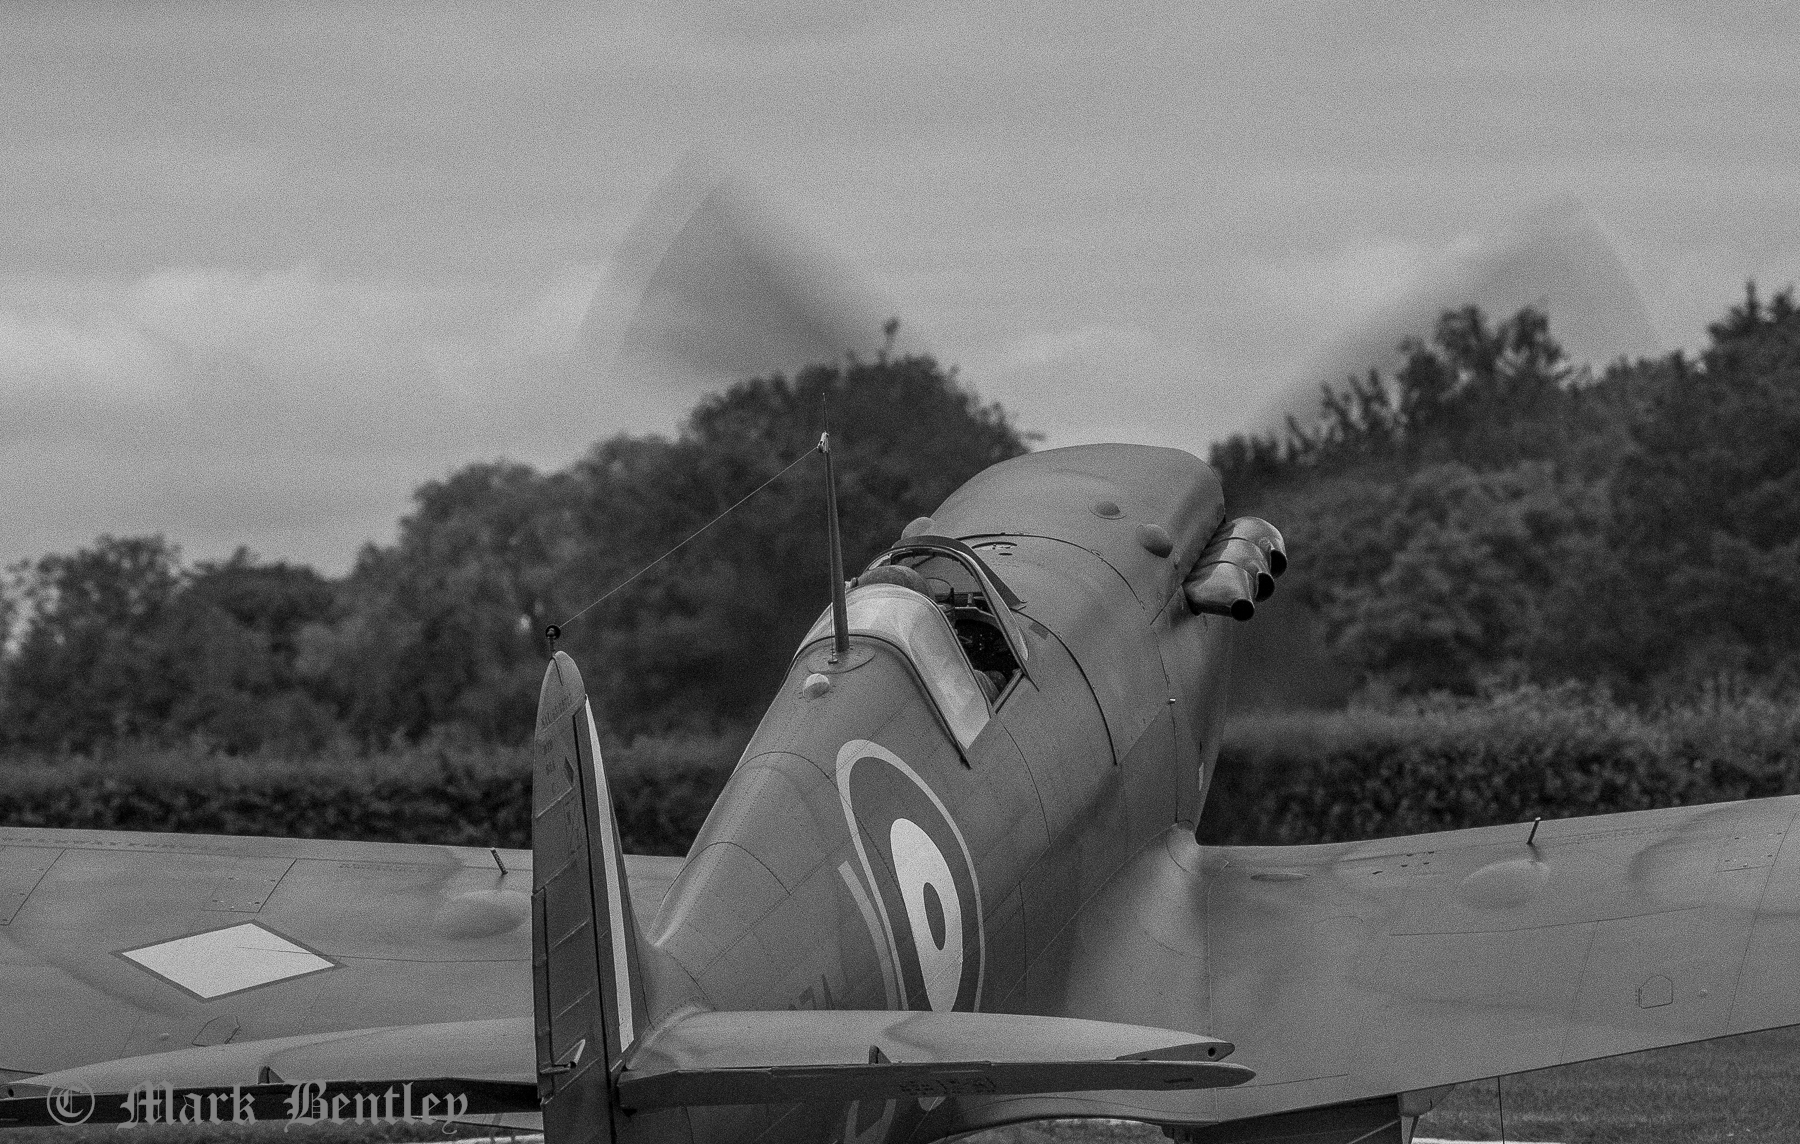 C021 Supermarine Spitfire